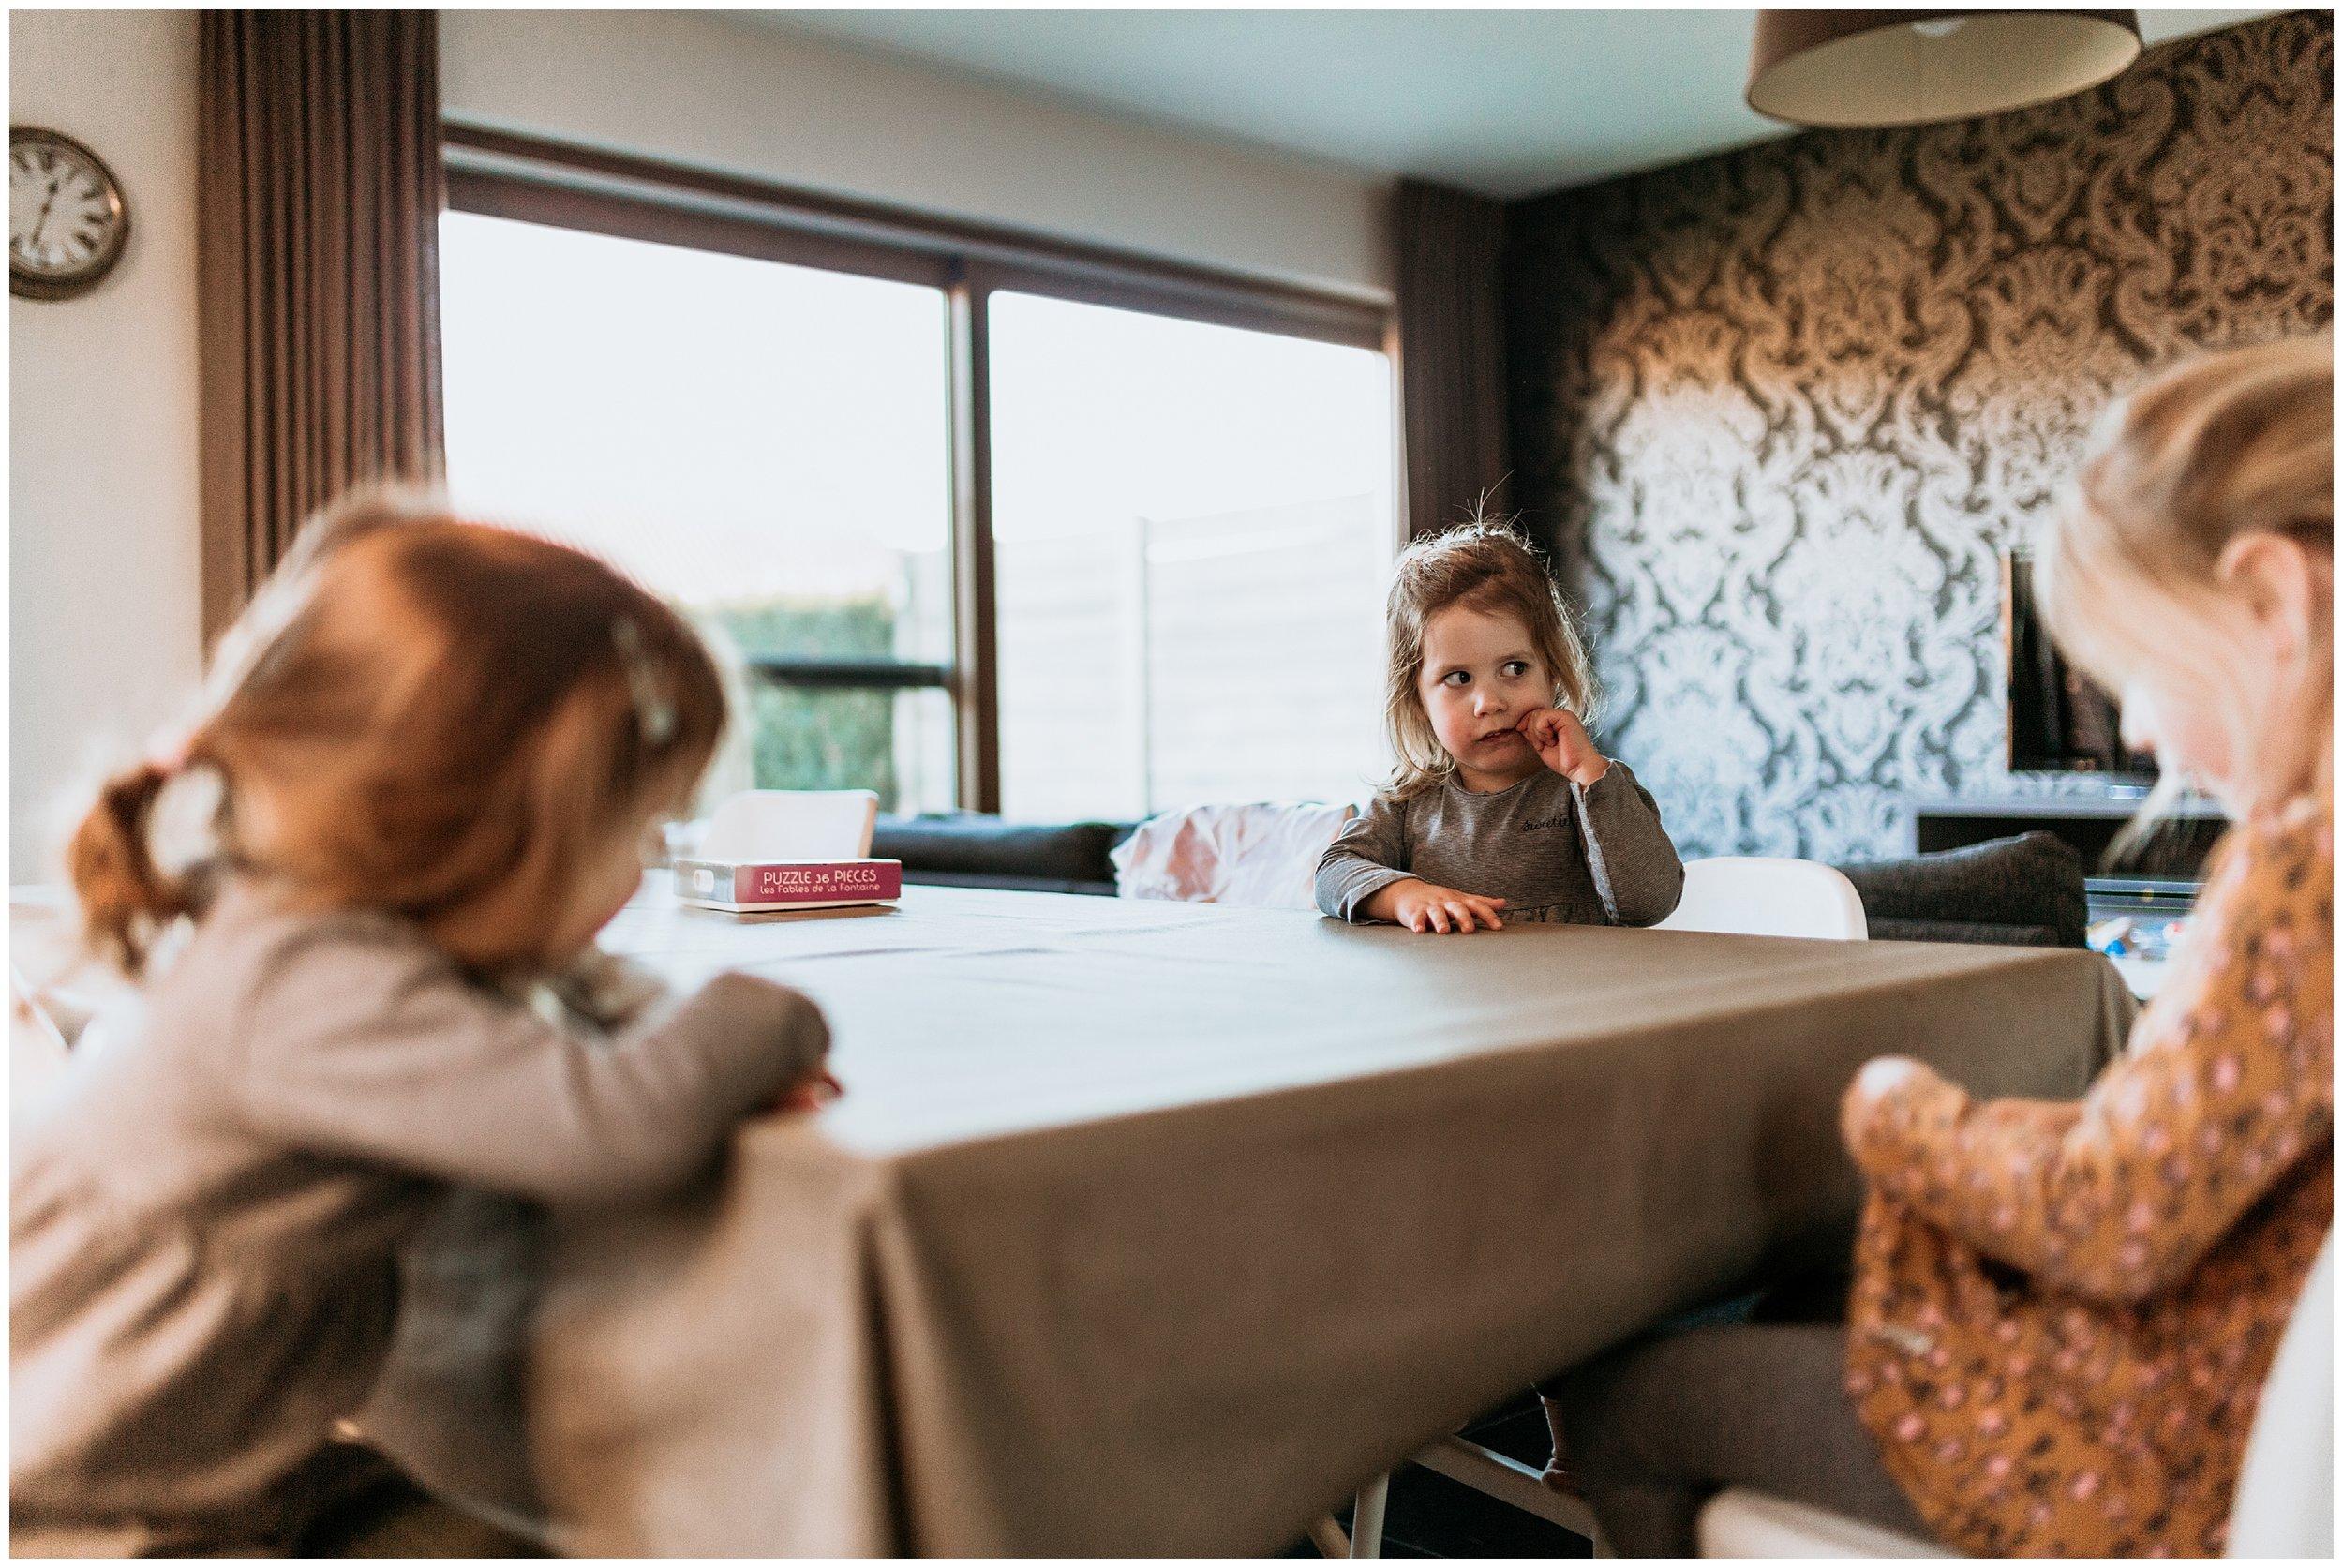 Day-in-the-life-lisa-helsen-herentals-vorselaar_0007.jpg